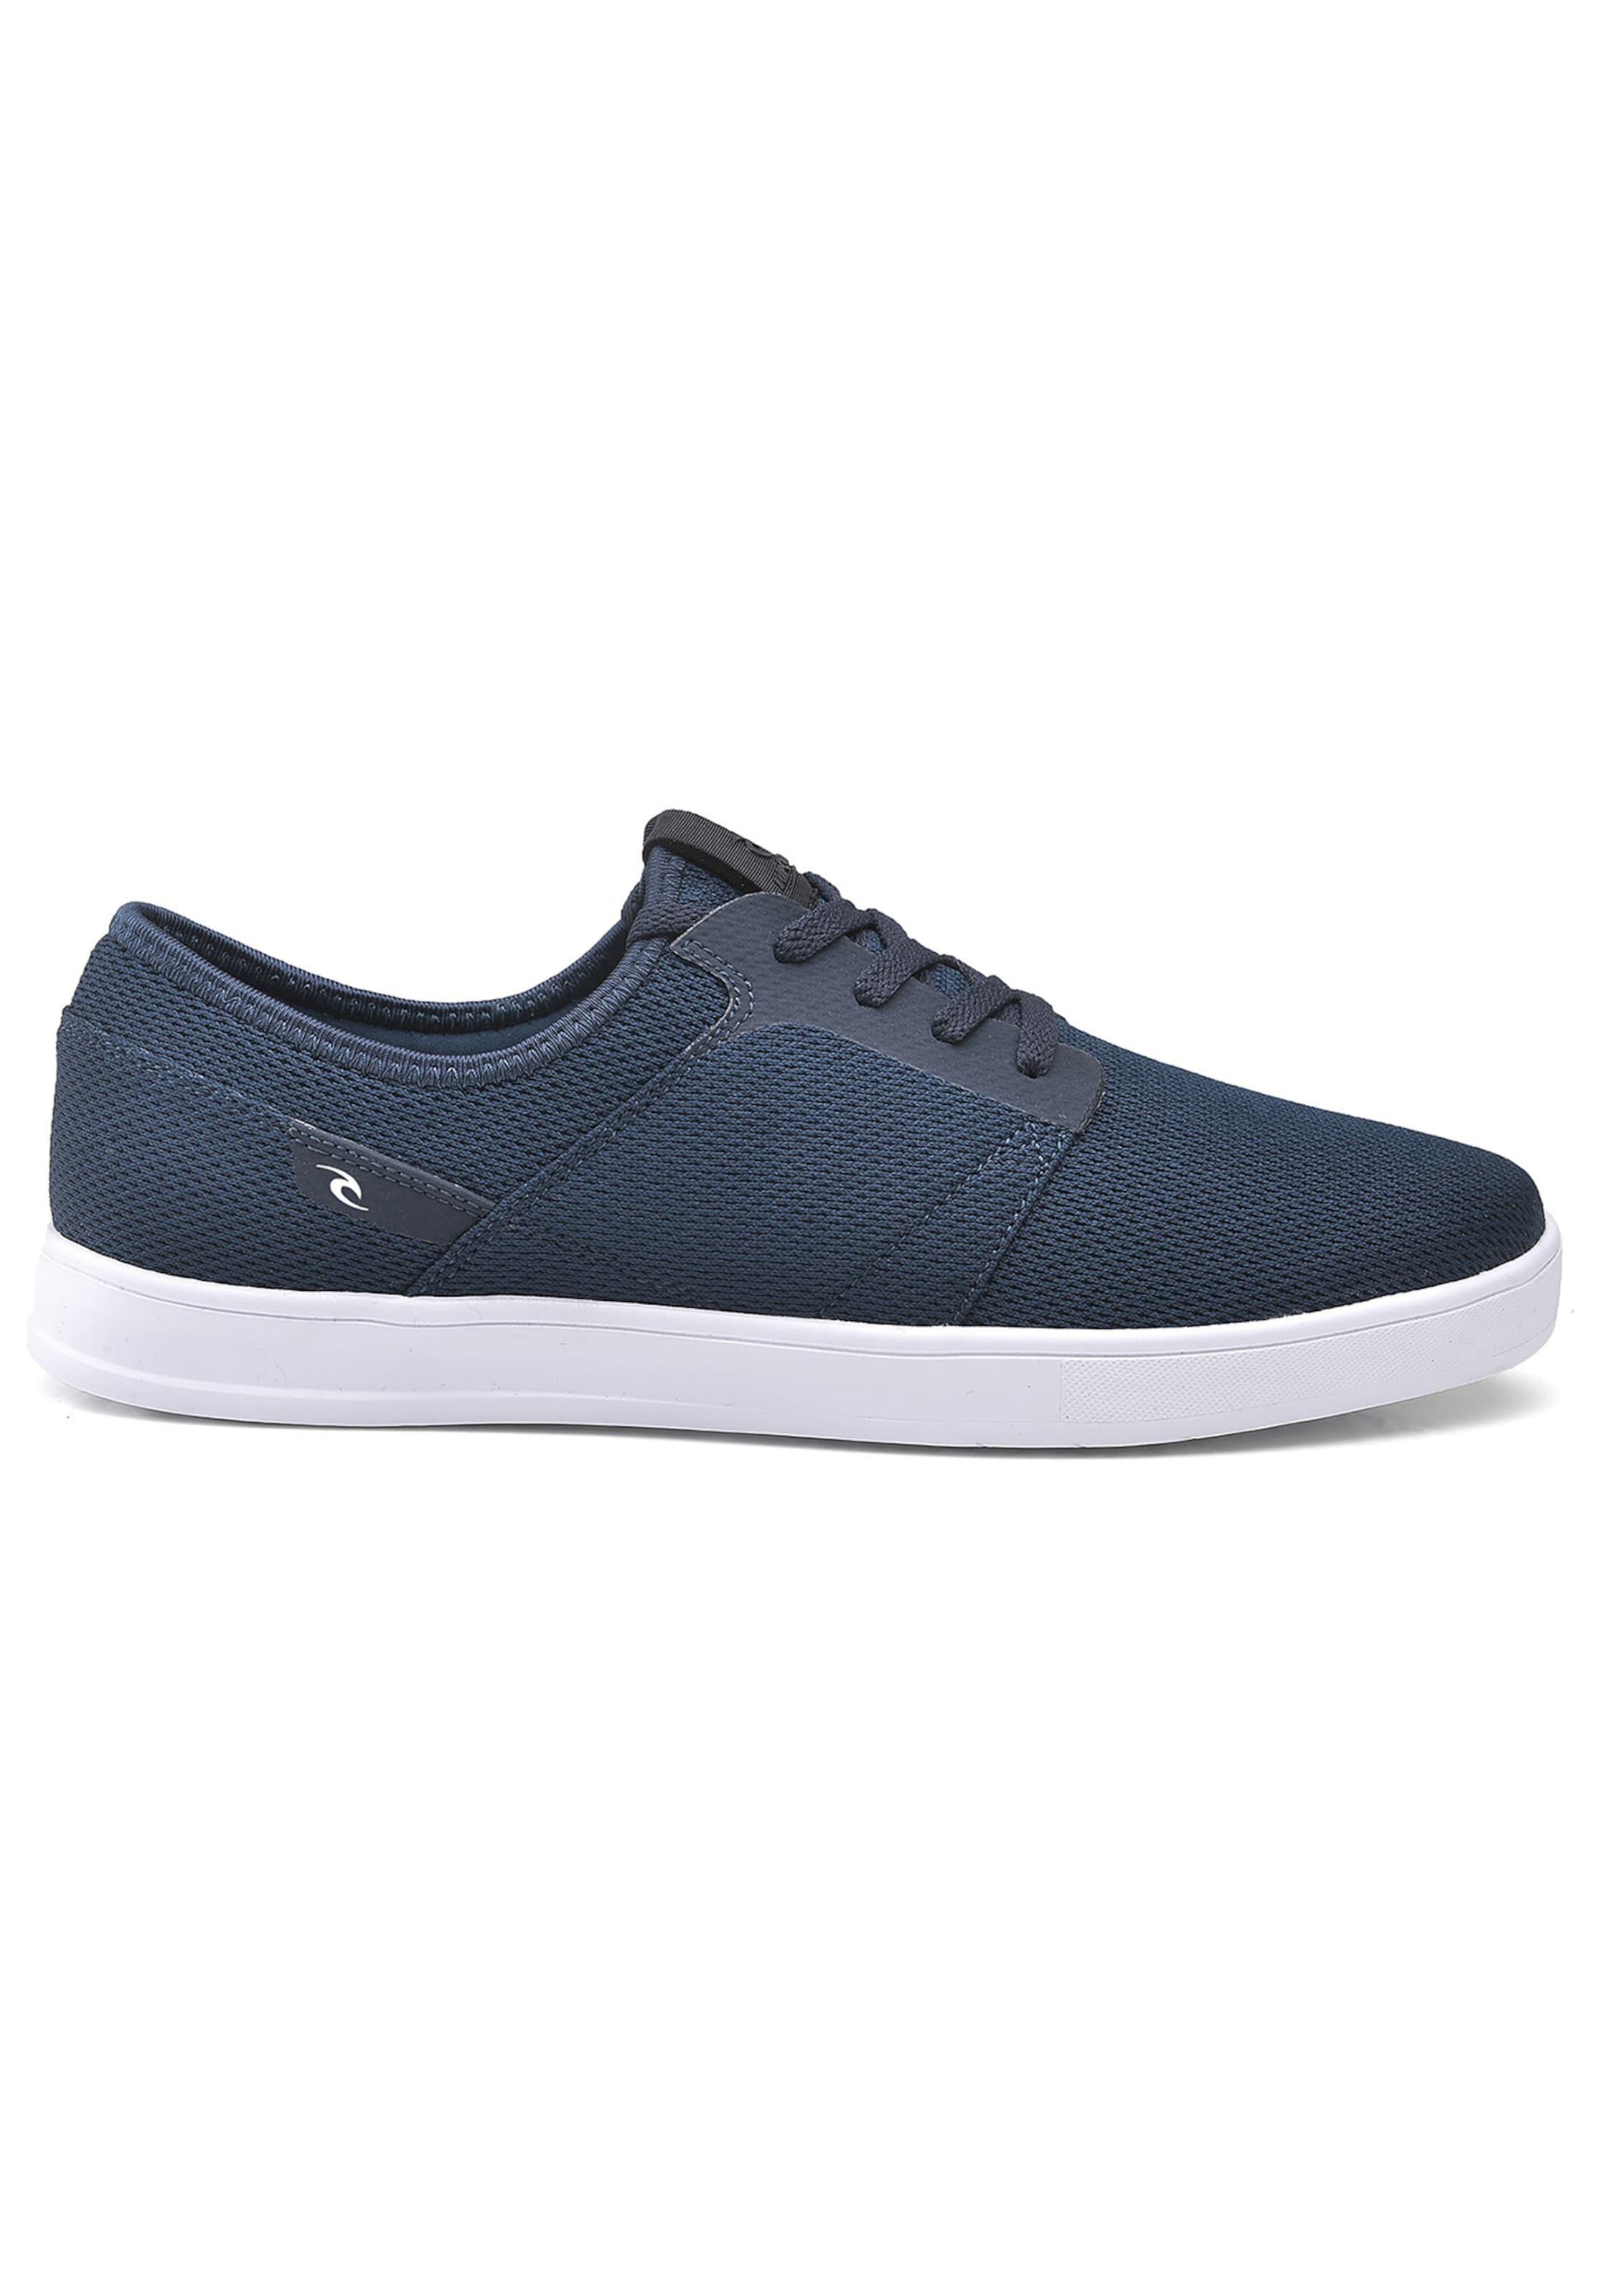 RIP CURL CURL RIP Raglan Sneaker Günstige und langlebige Schuhe 512fc0